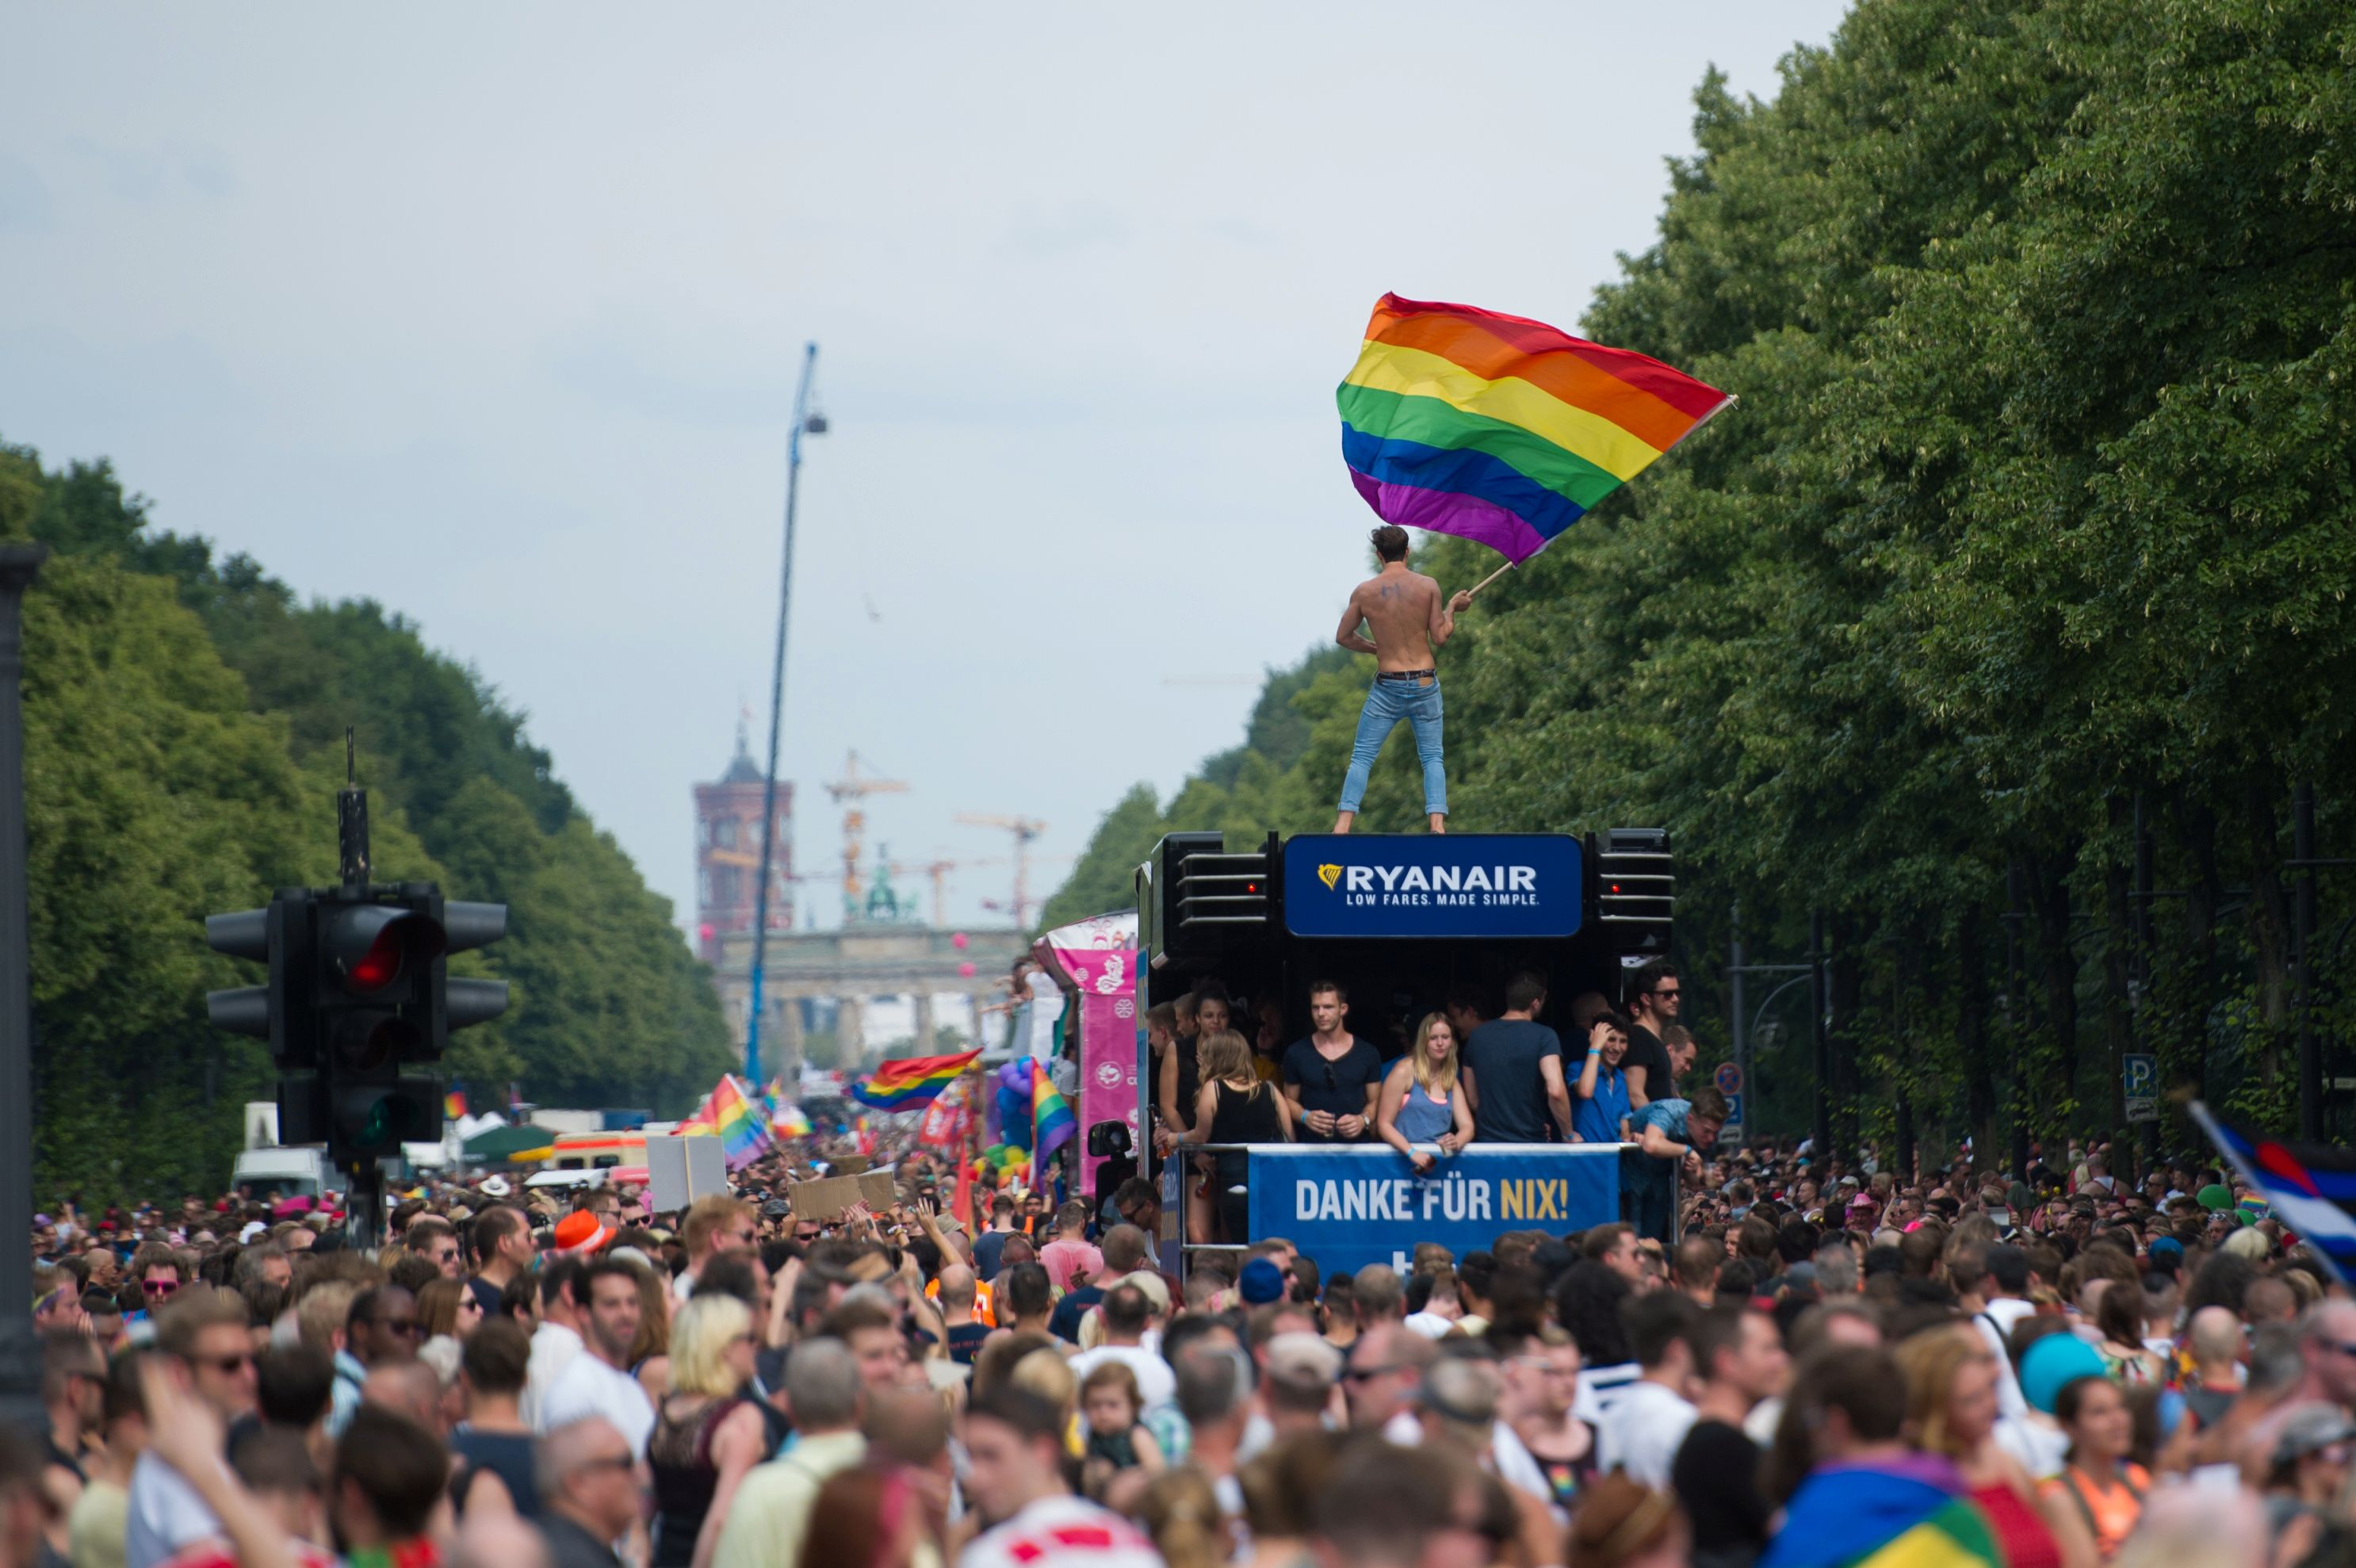 politimann homofil sex stram fitte nærbilde pic